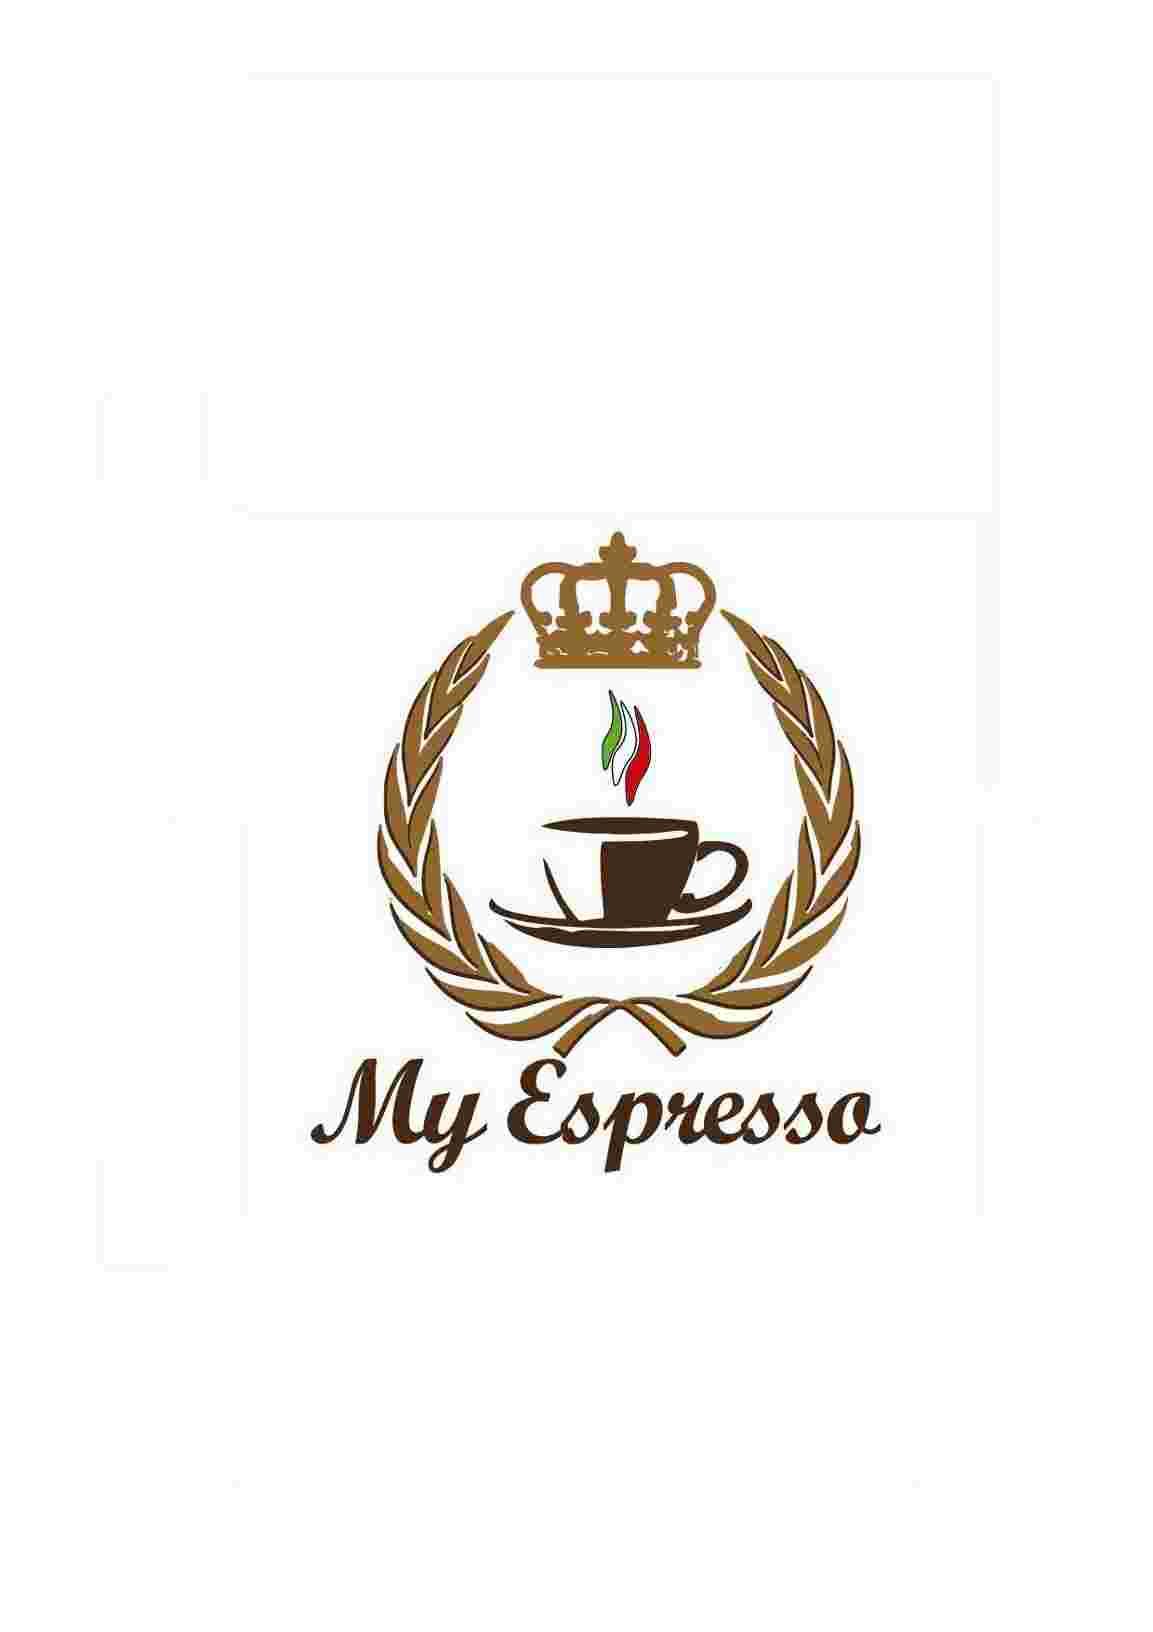 MY ESPRESSO